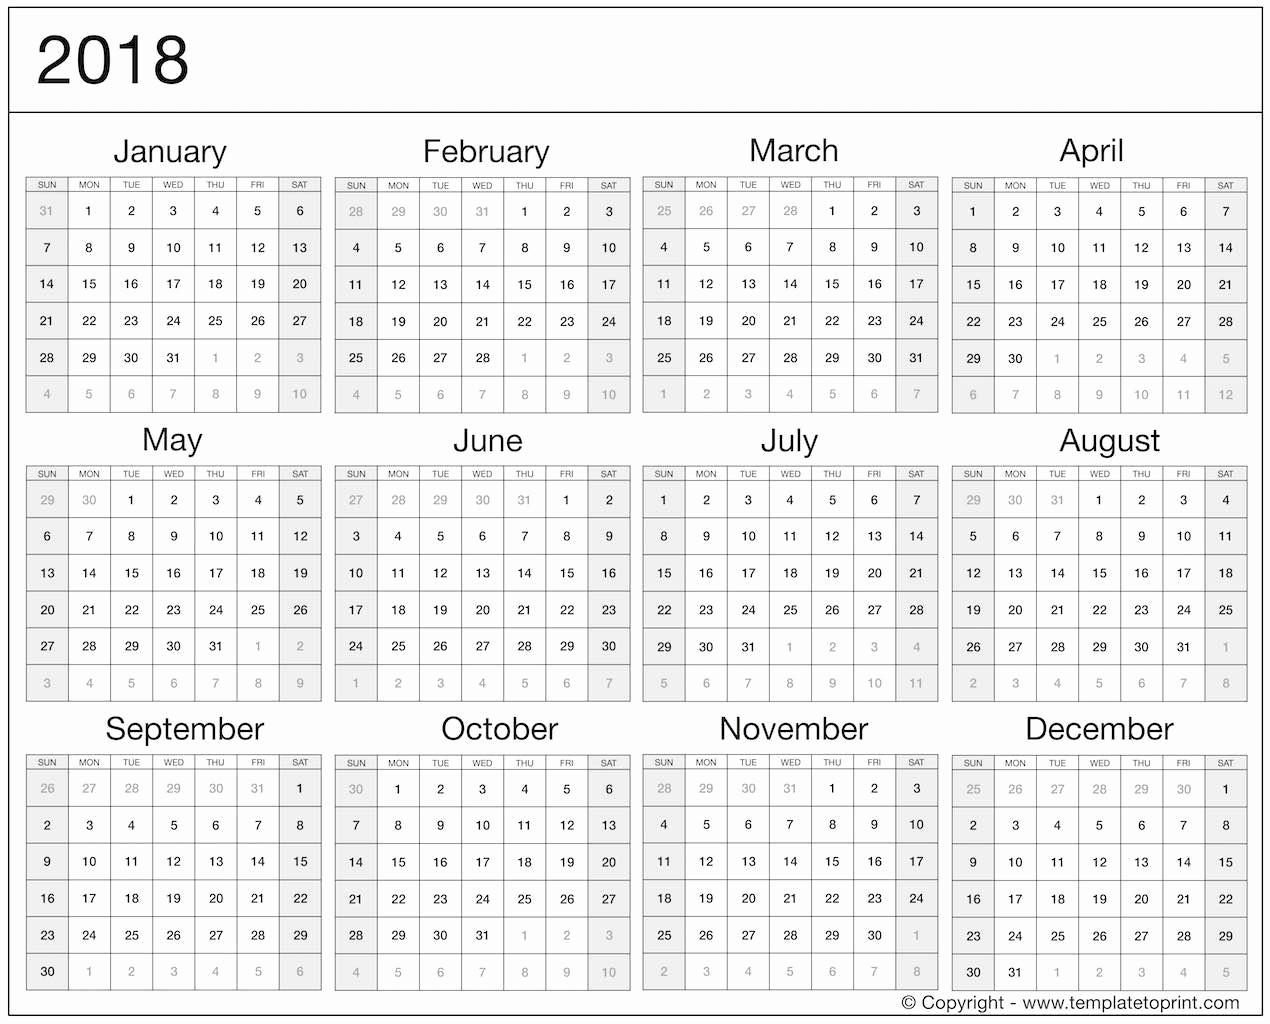 Calendar 2018 Printable with Holidays Unique 2018 Calendar Uk Printable